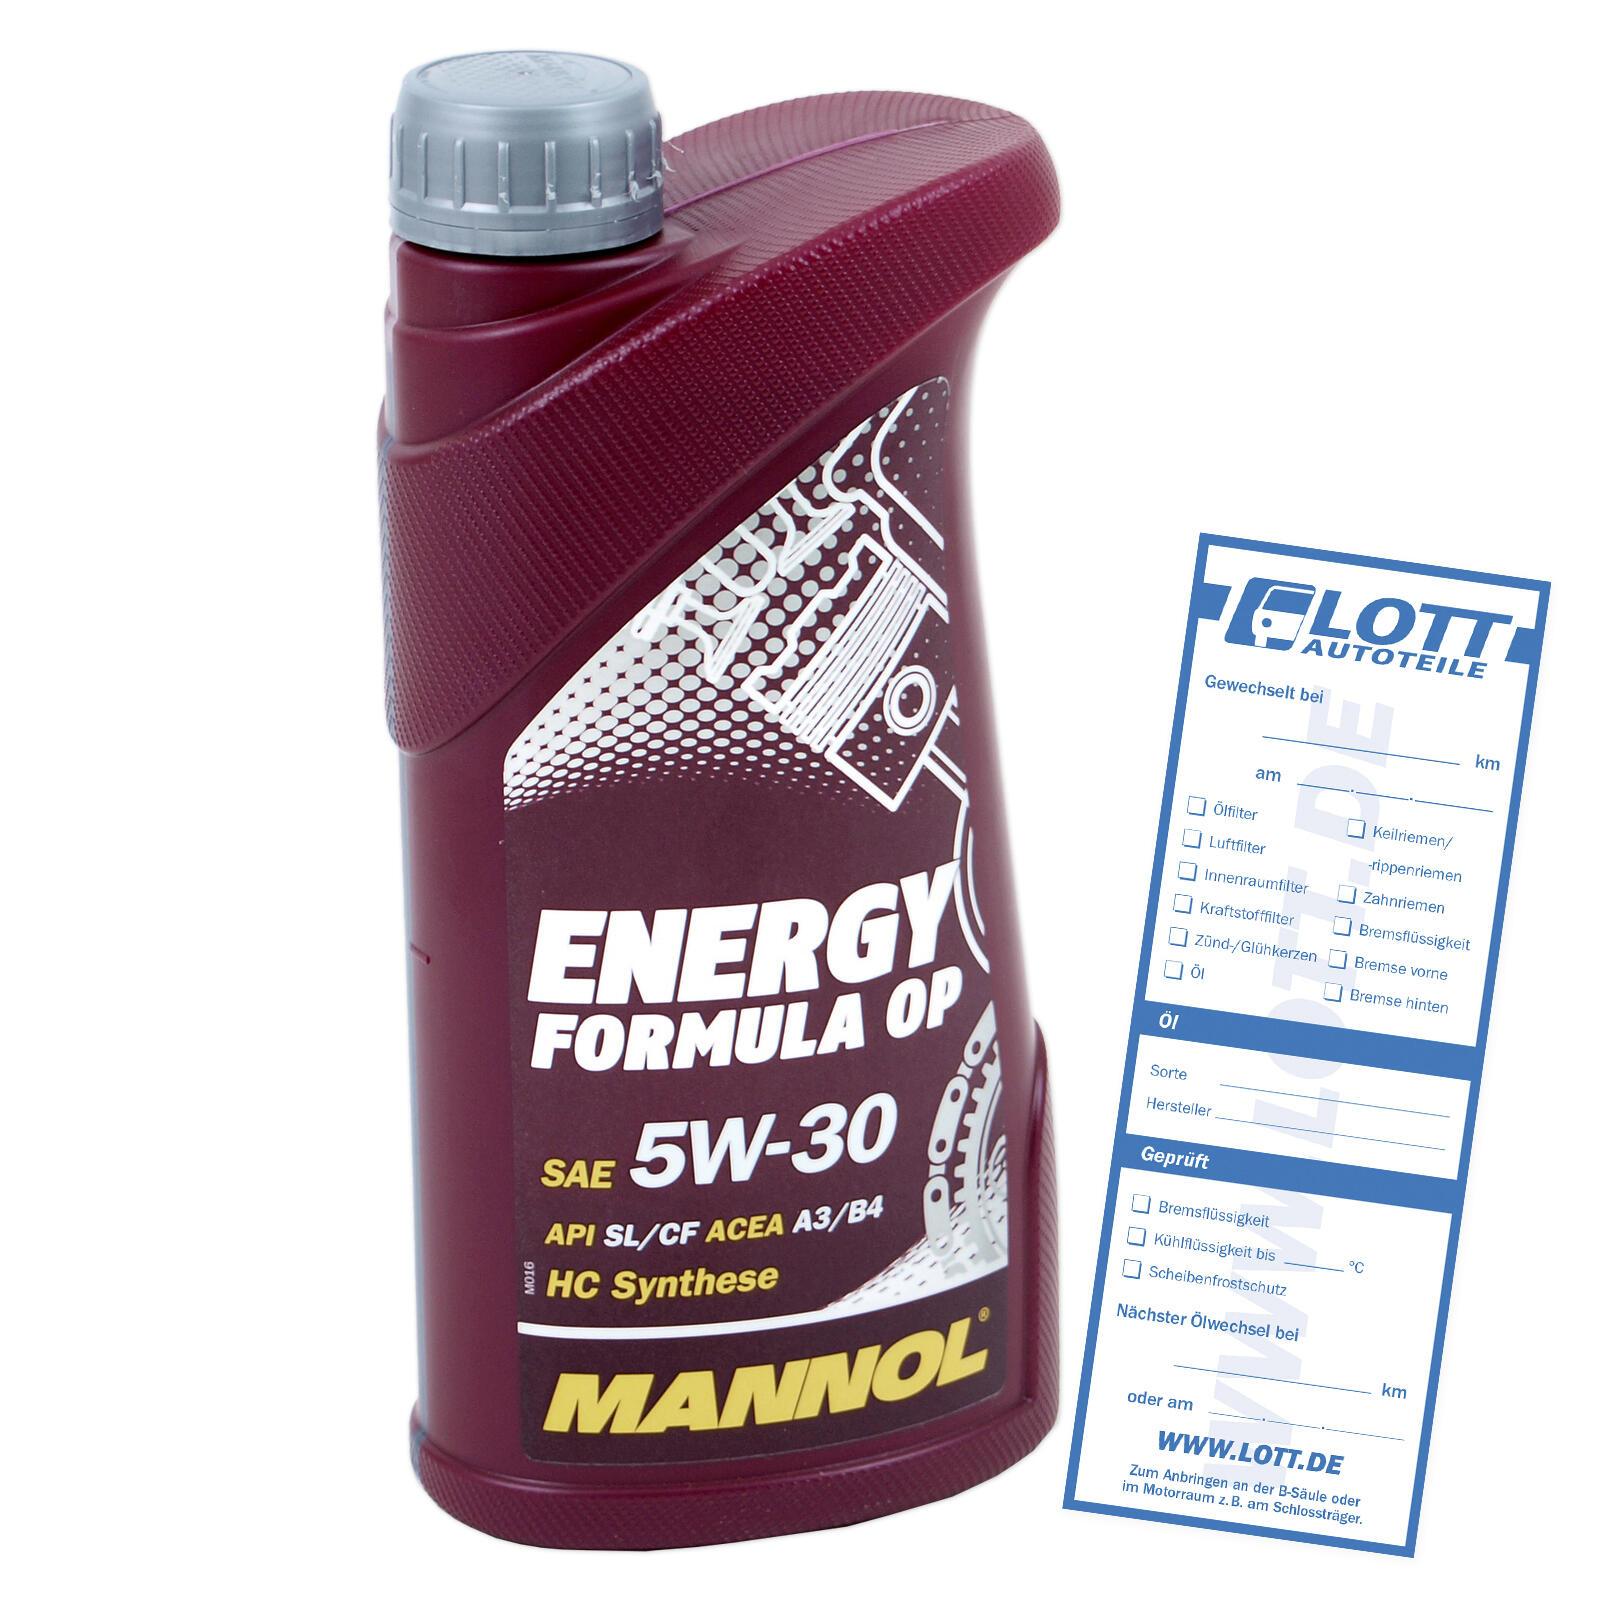 Motoröl Mannol Energy Formula OP 5W-30 1L hydrosynthetisch